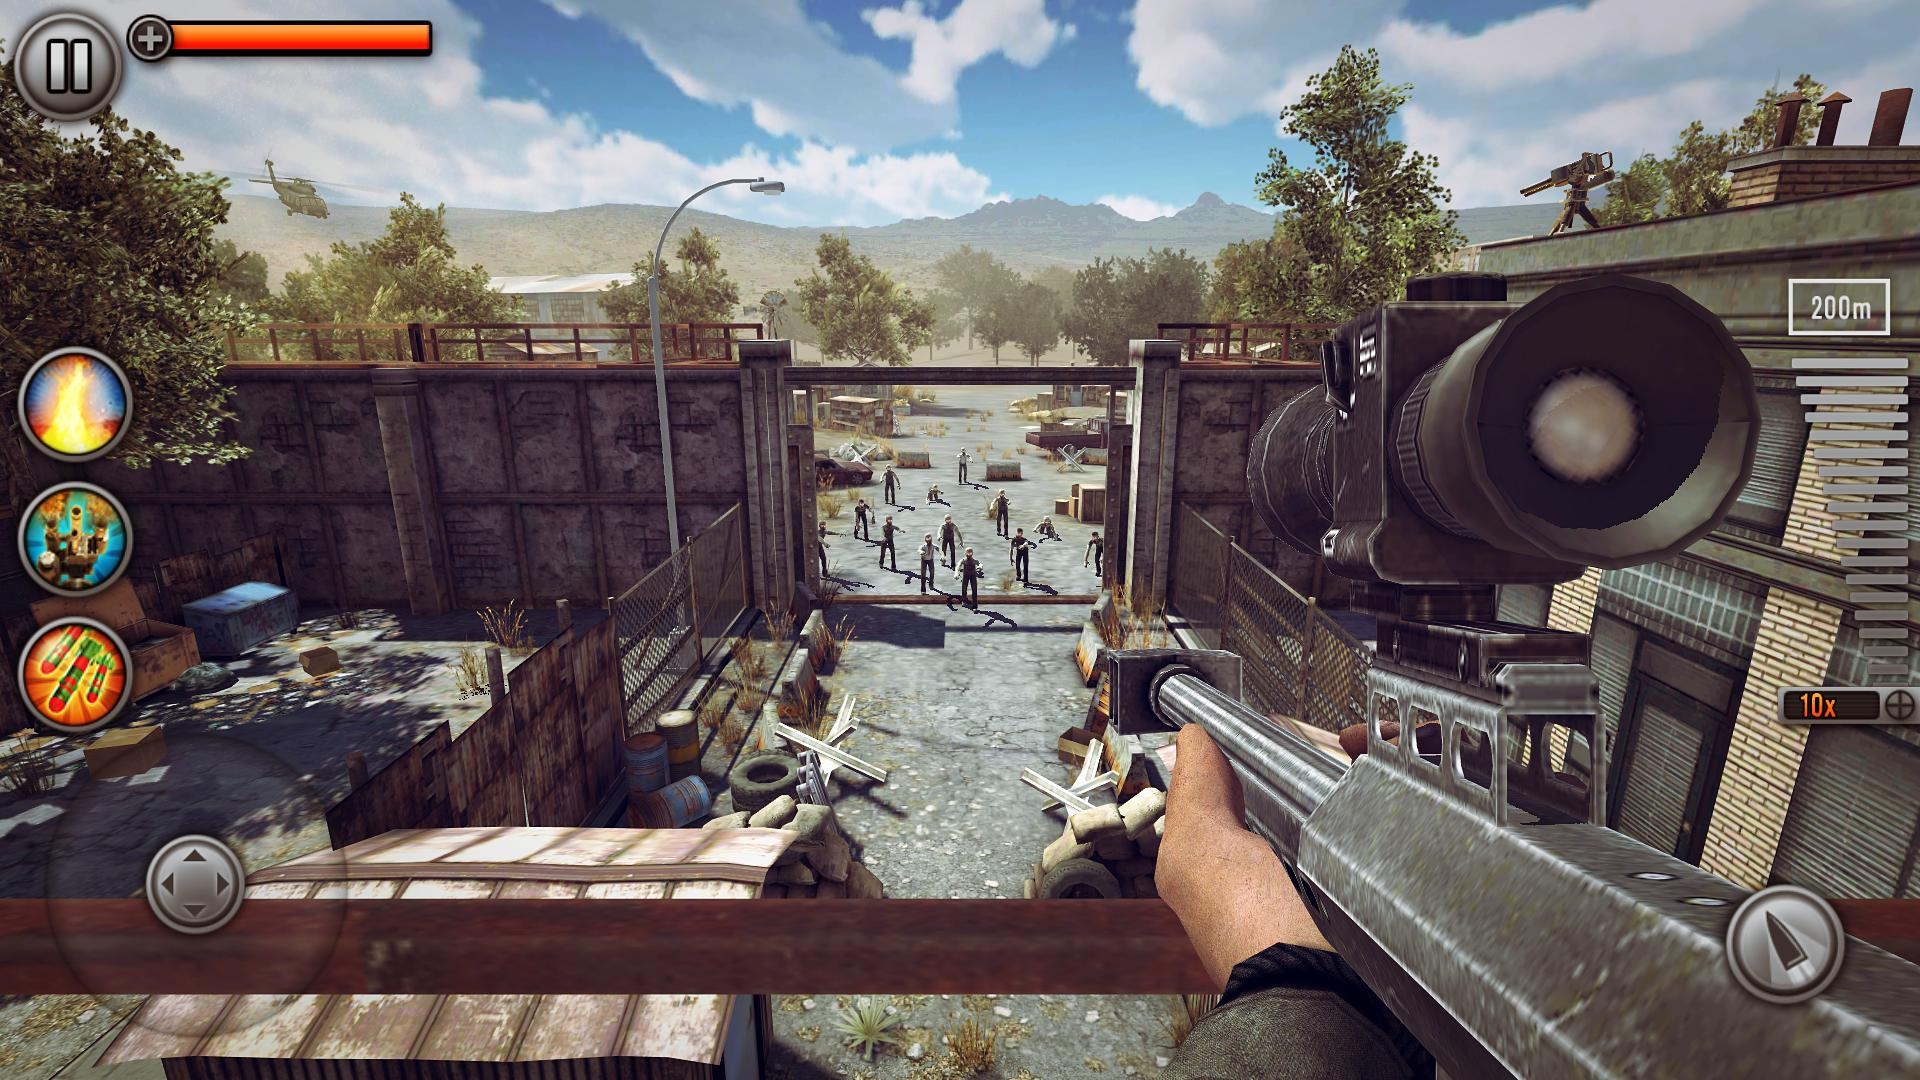 Last Hope Sniper Zombie War: Shooting Games FPS 2.12 Screenshot 5